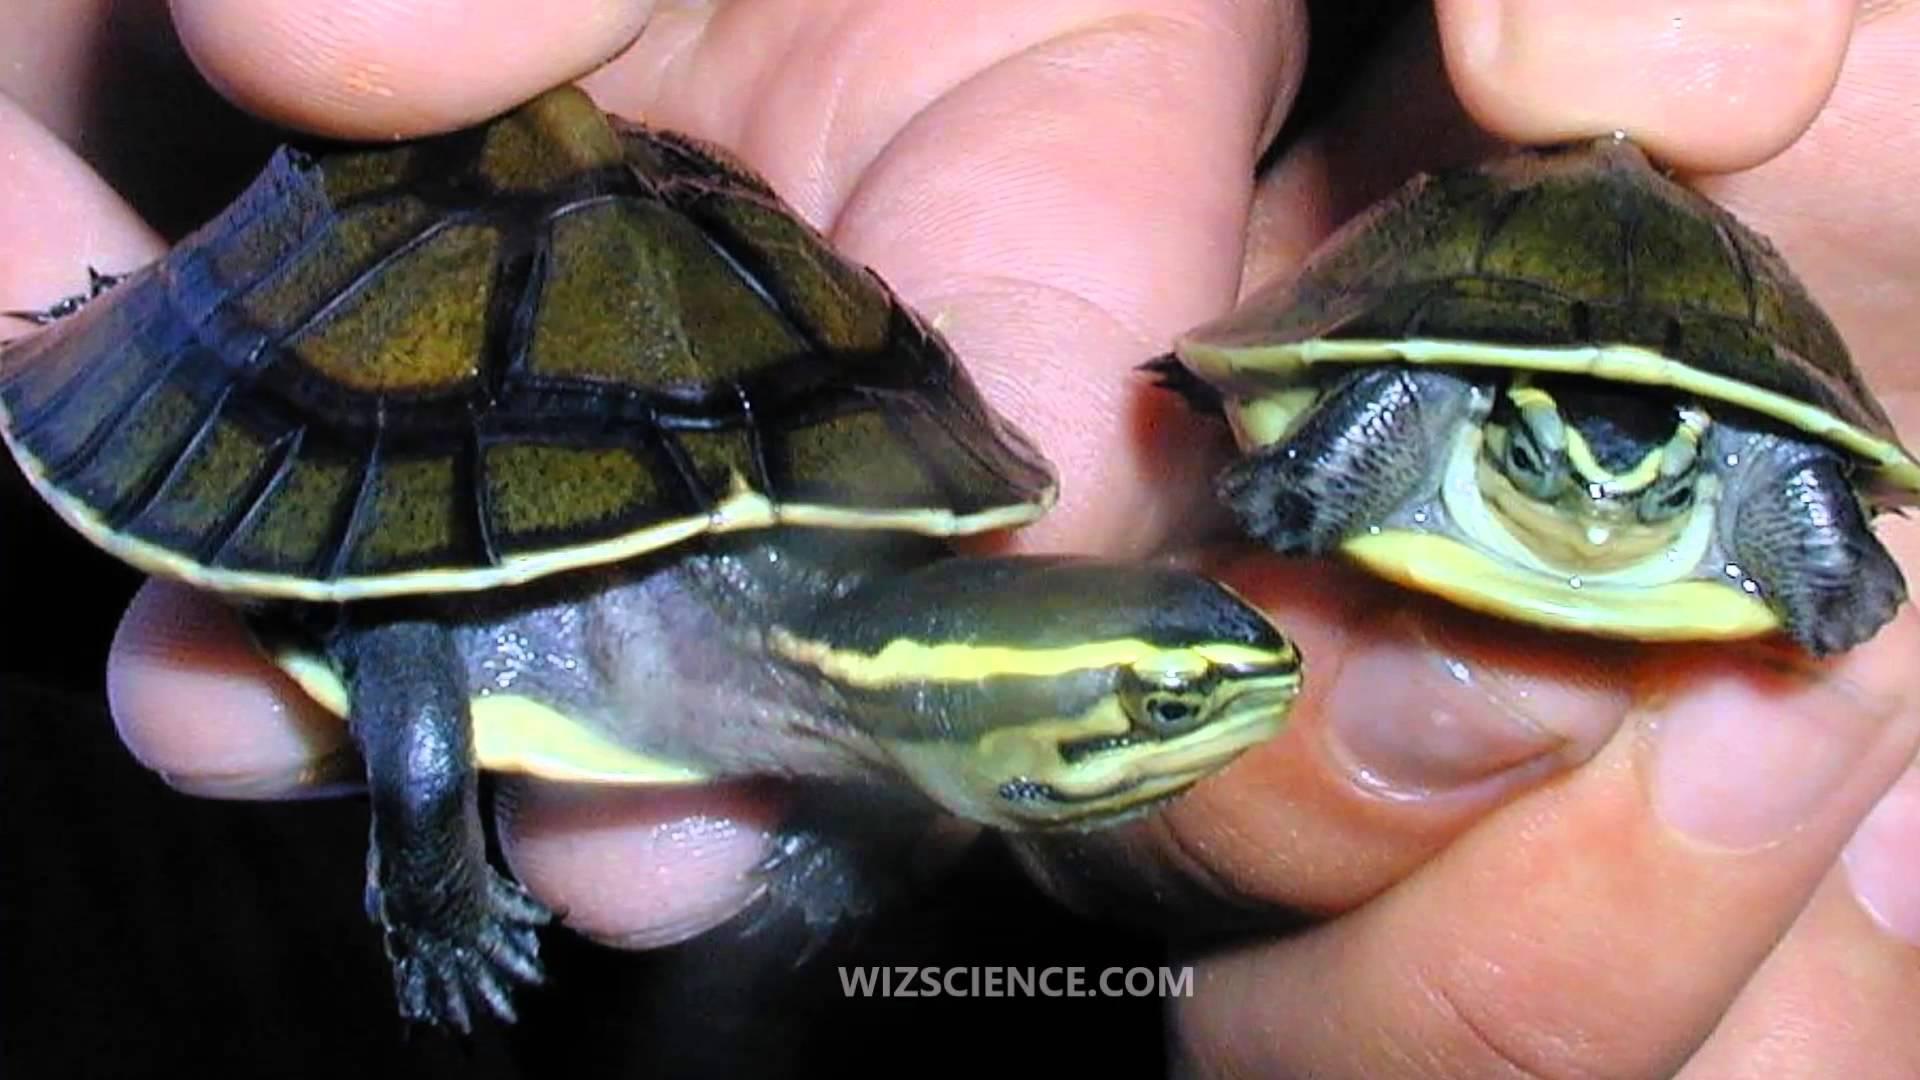 Amboina box turtle - Video Learning - WizScience.com - YouTube